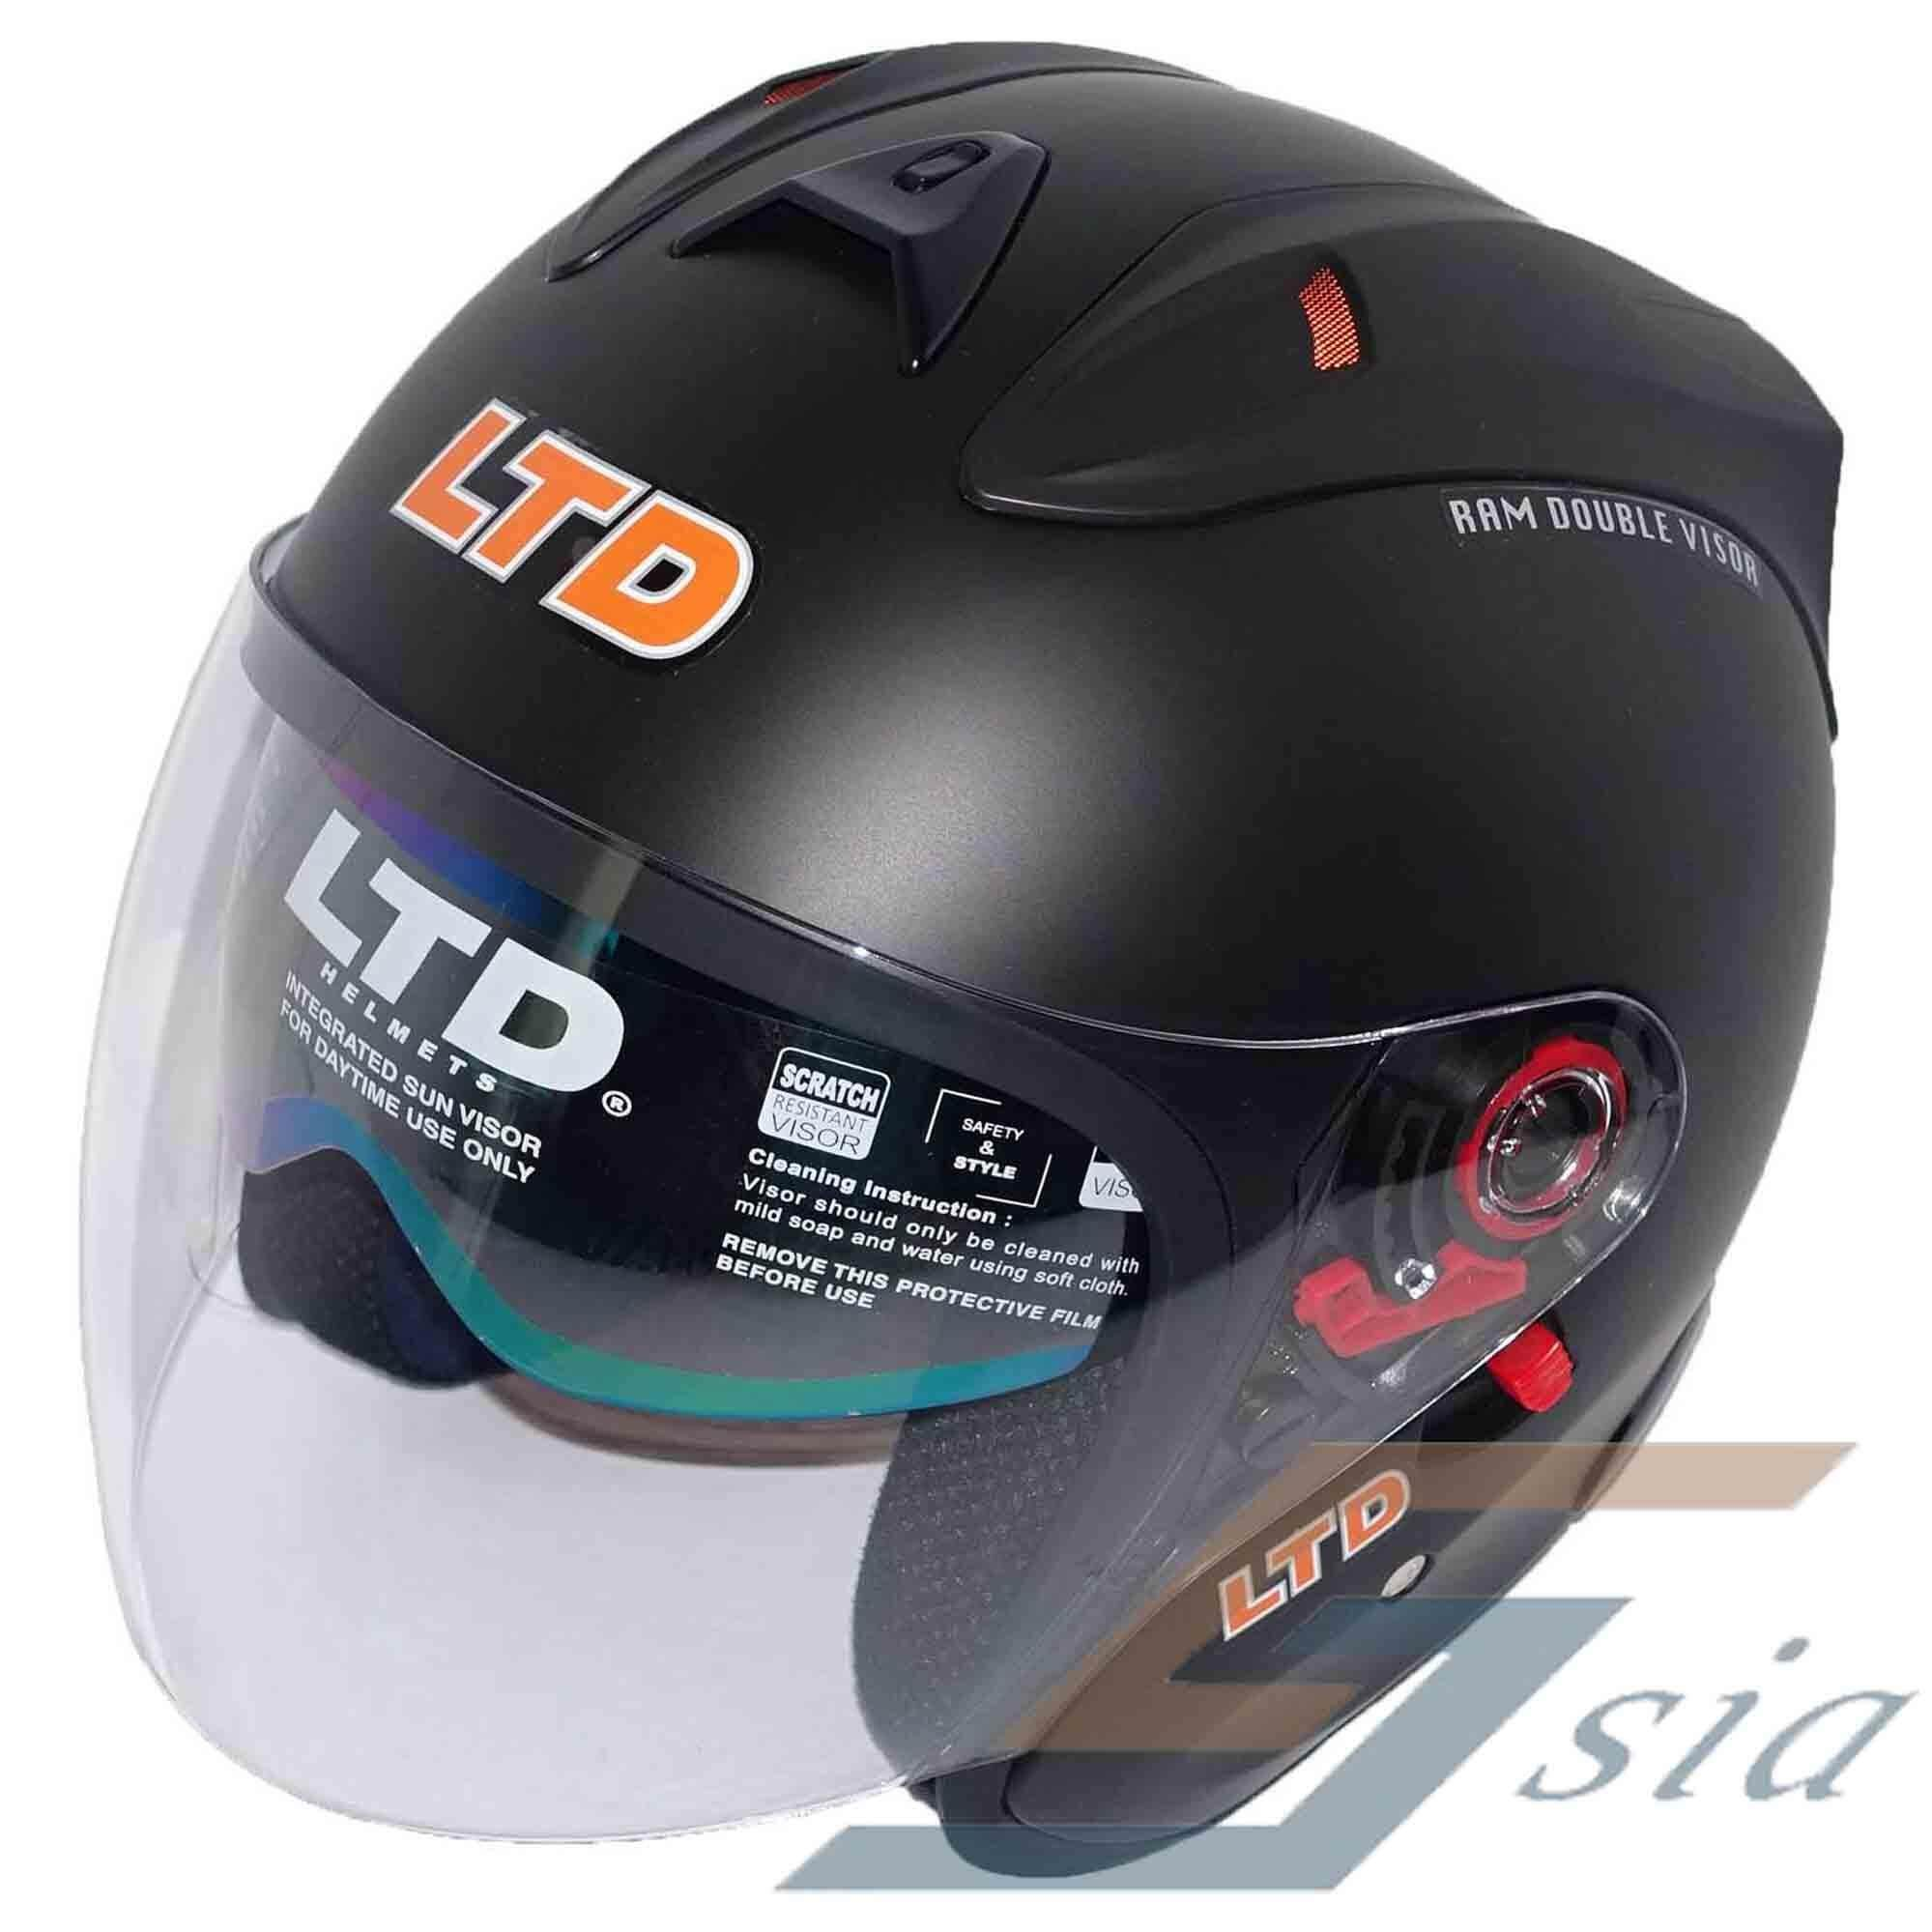 Helmet Buy At Best Price In Malaysia Flat Visor Kyt Vendetta 2 Ori Iridium Silver Ltd Infinity Ram Double Matt Black